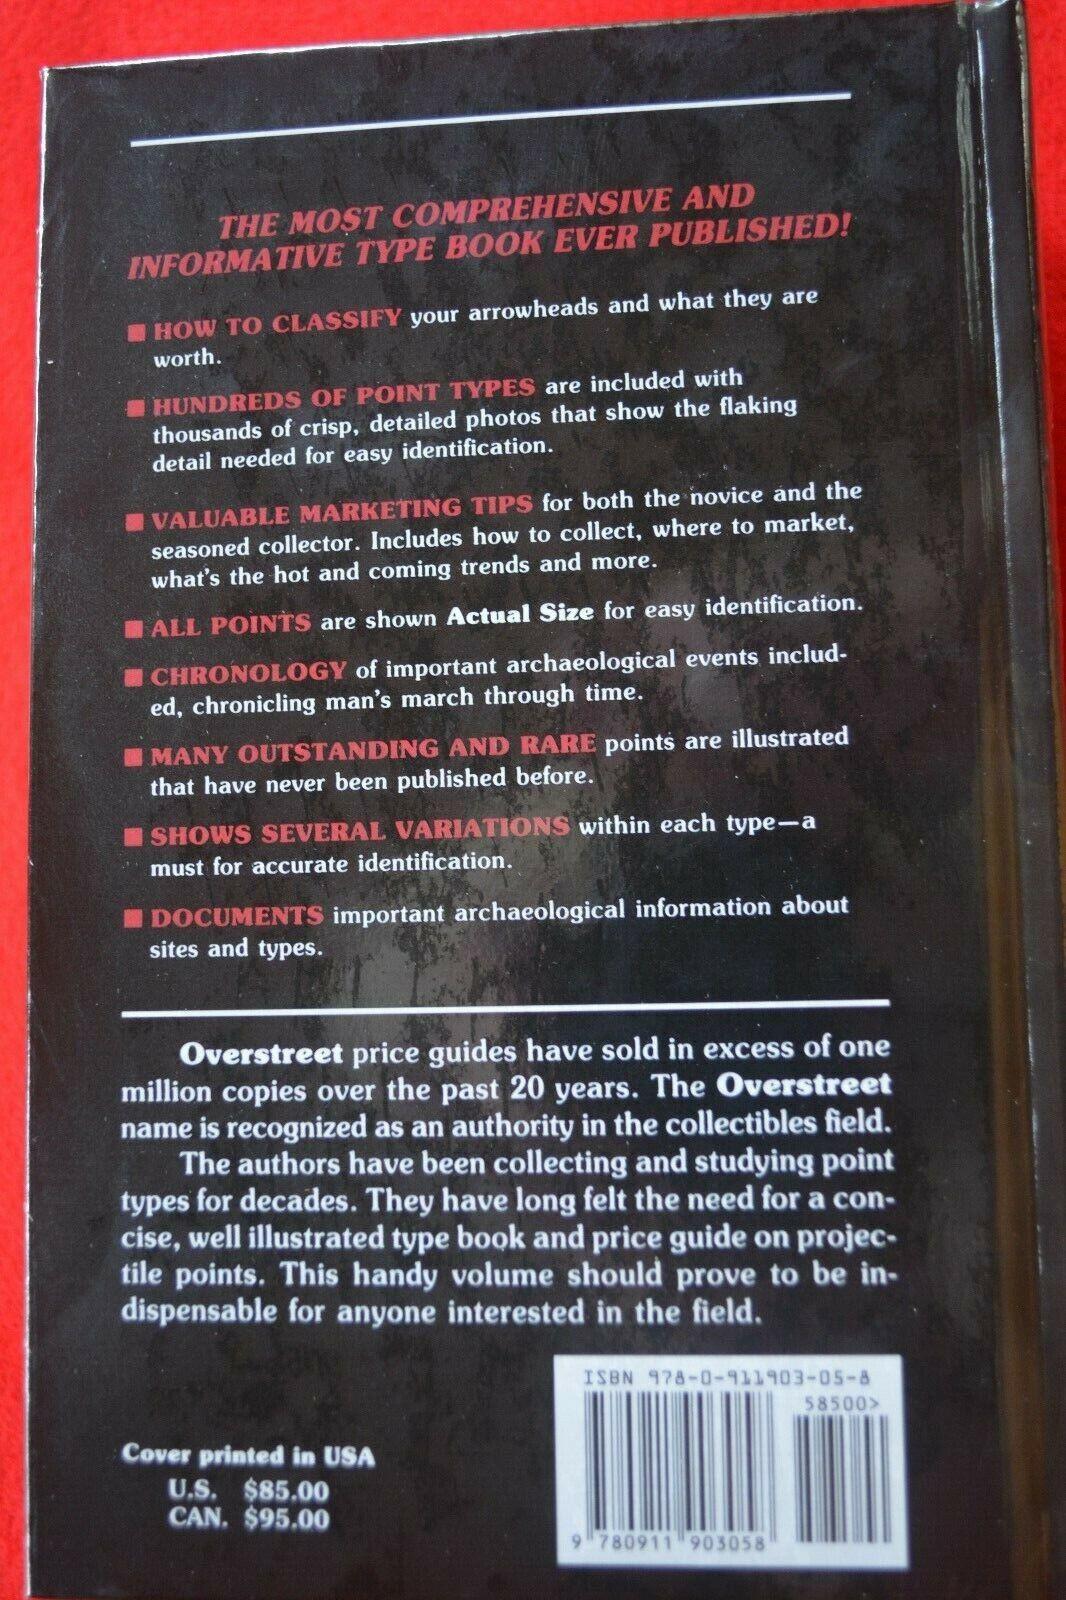 ::Overstreet Arrowheads 1st. Edition, BRAND NEW